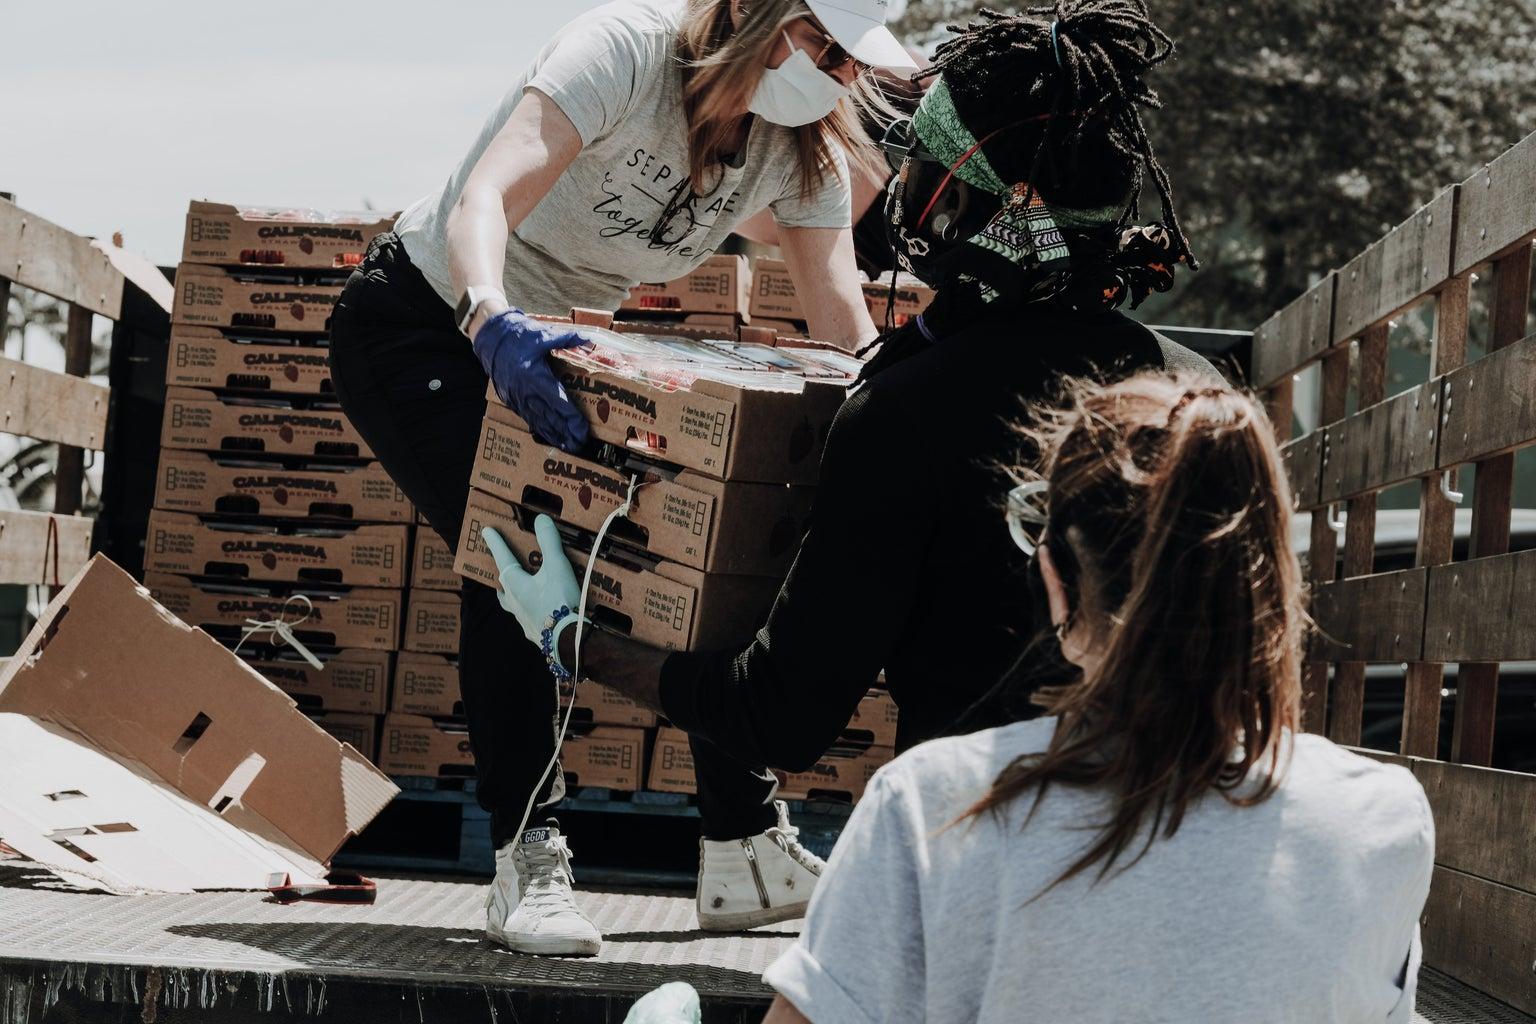 Volunteering help